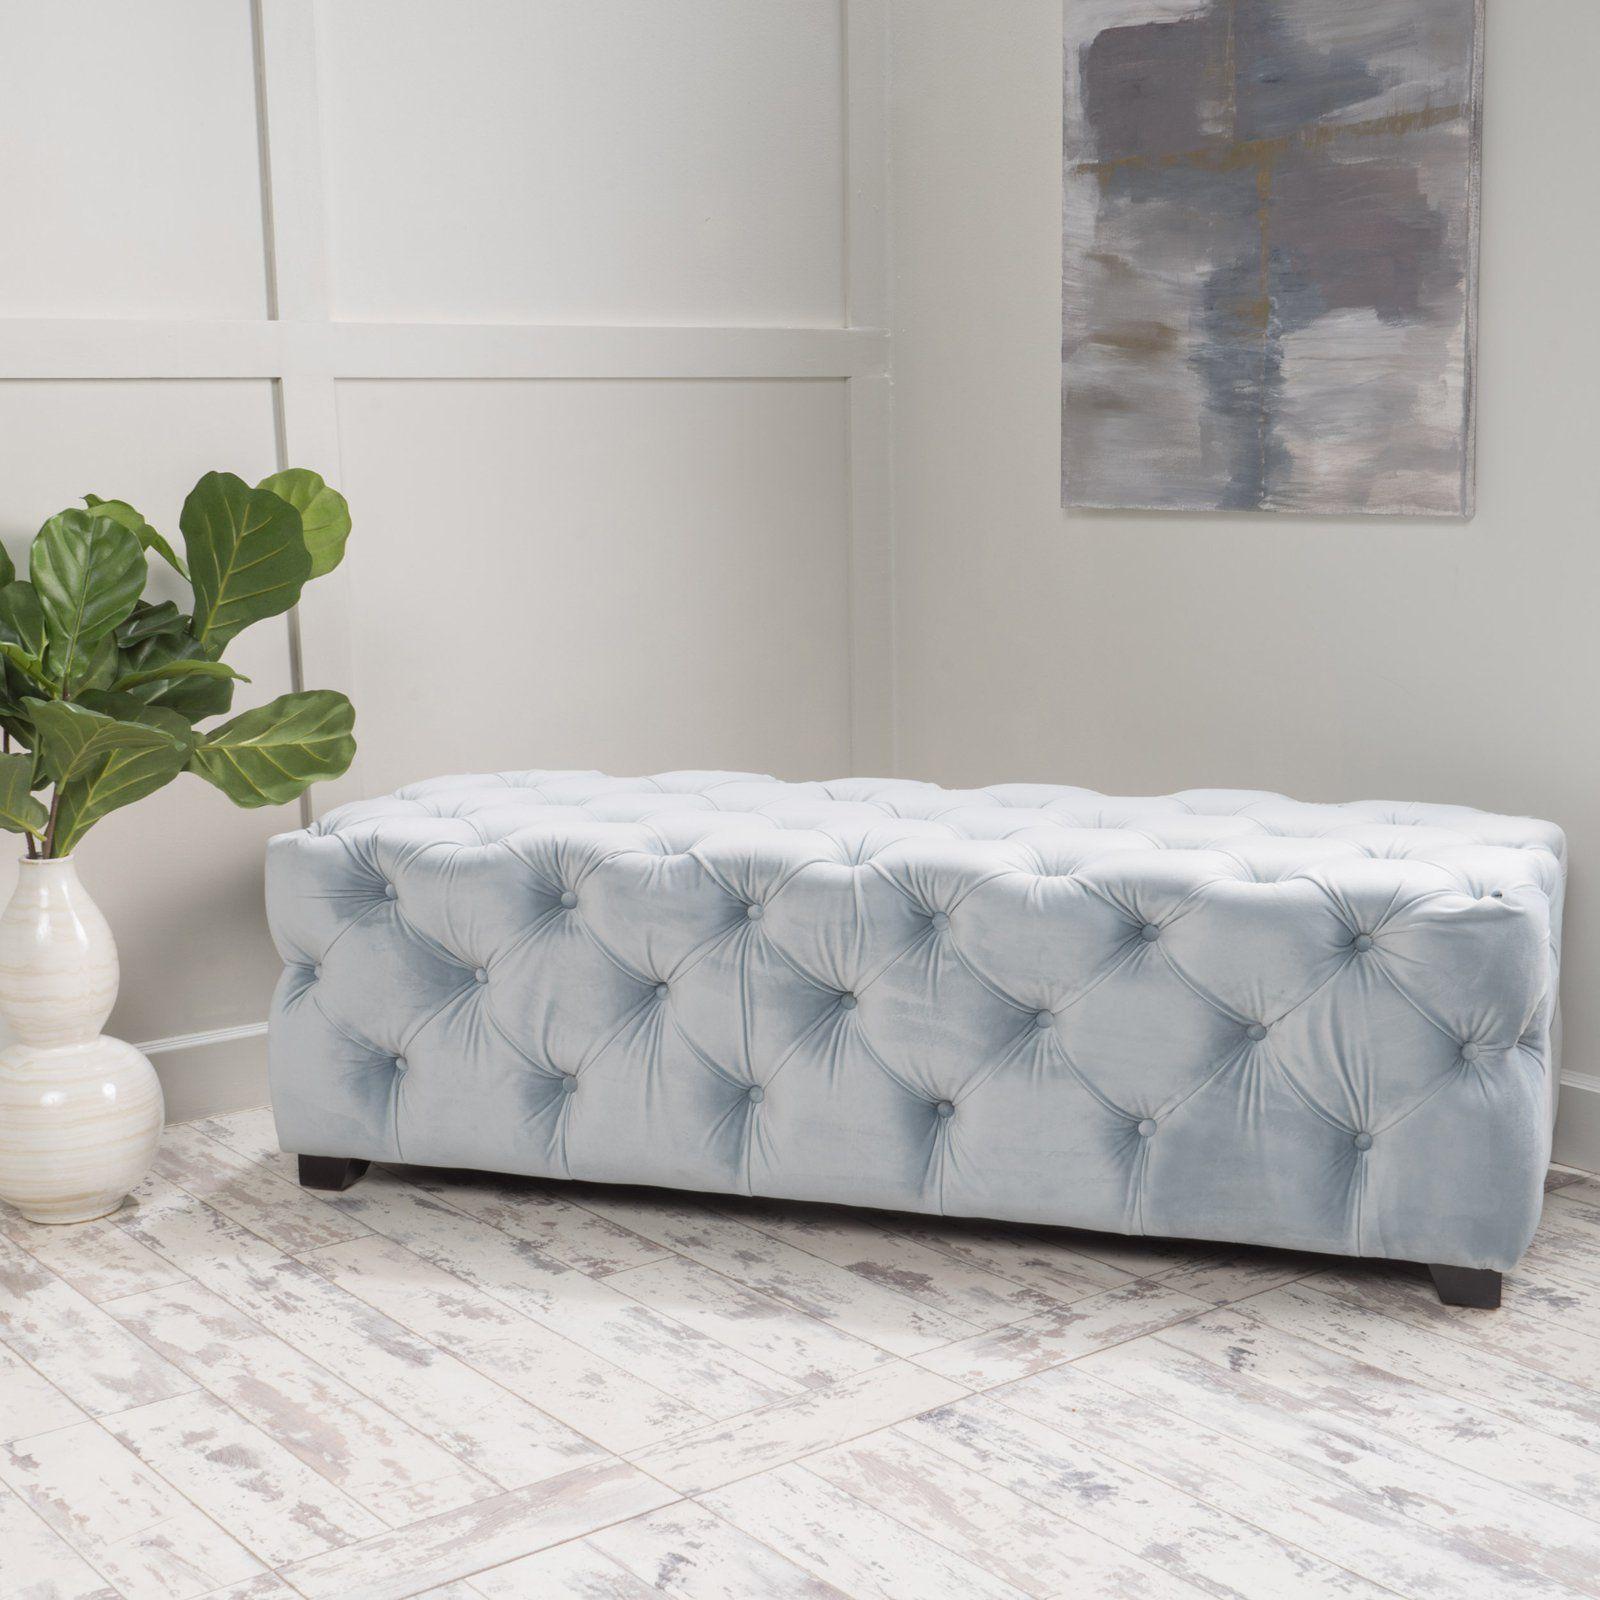 Pleasant Best Selling Home Barrett New Velvet Indoor Bench 298422 Andrewgaddart Wooden Chair Designs For Living Room Andrewgaddartcom